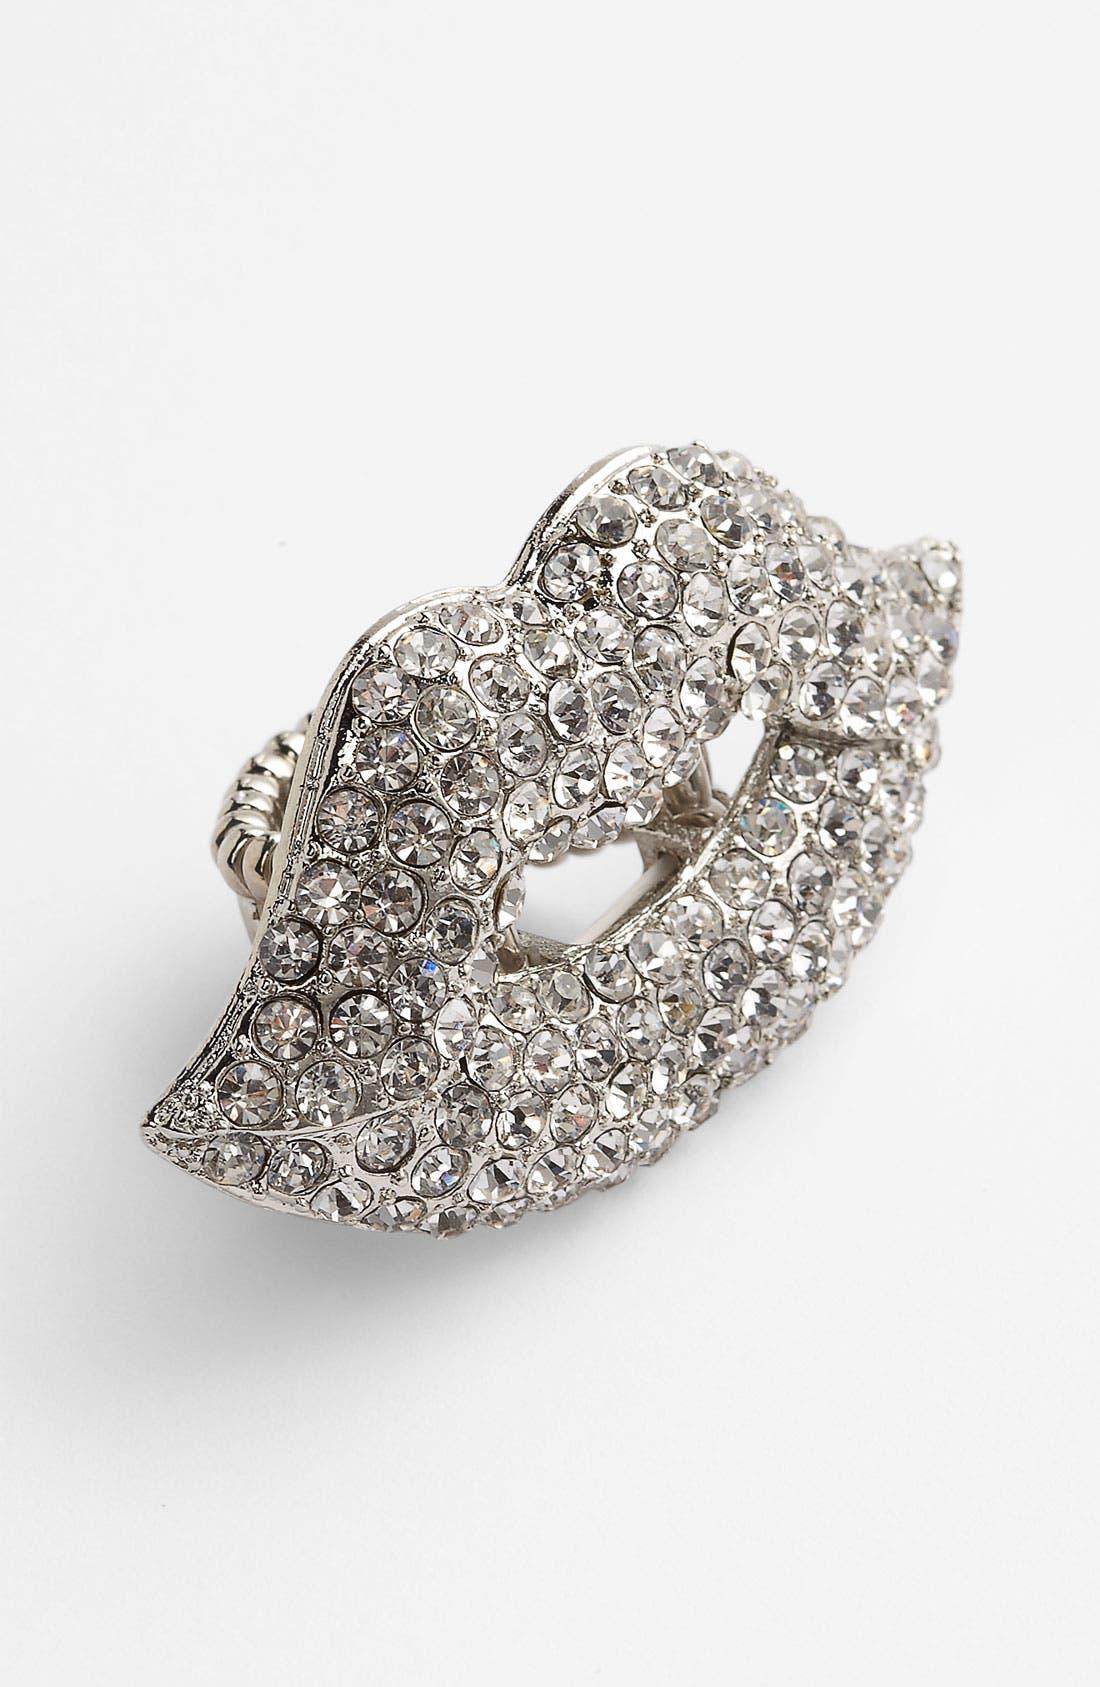 Alternate Image 1 Selected - Natasha Couture 'Lip' Ring